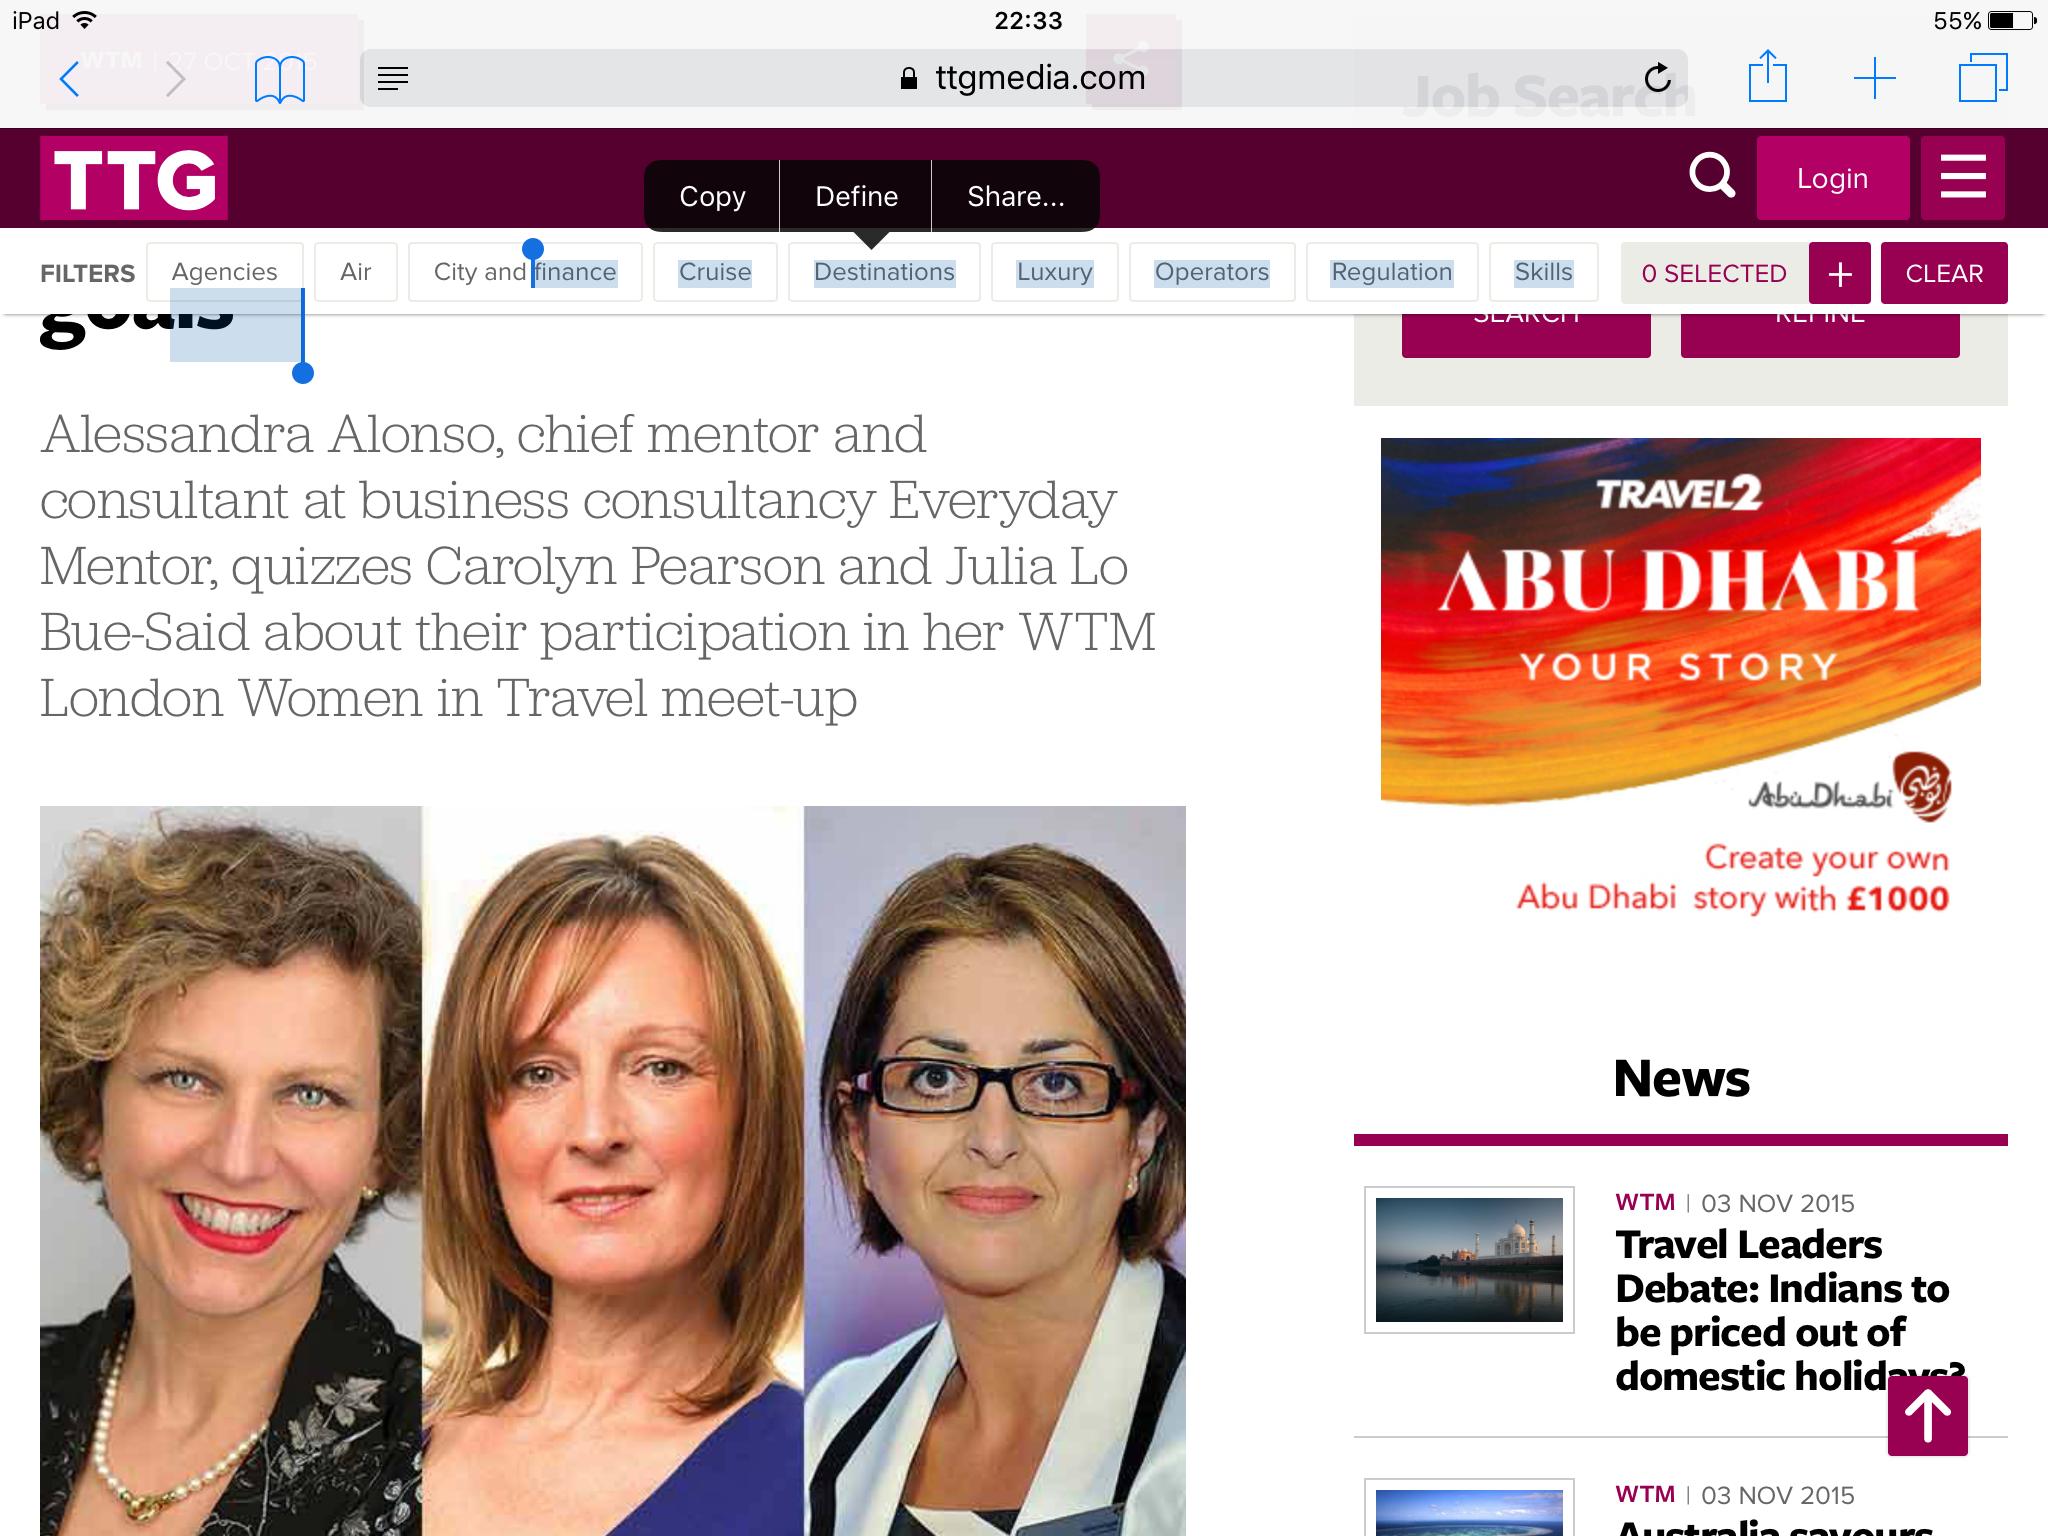 Inspirational Leadership Journeys from Women in Travel